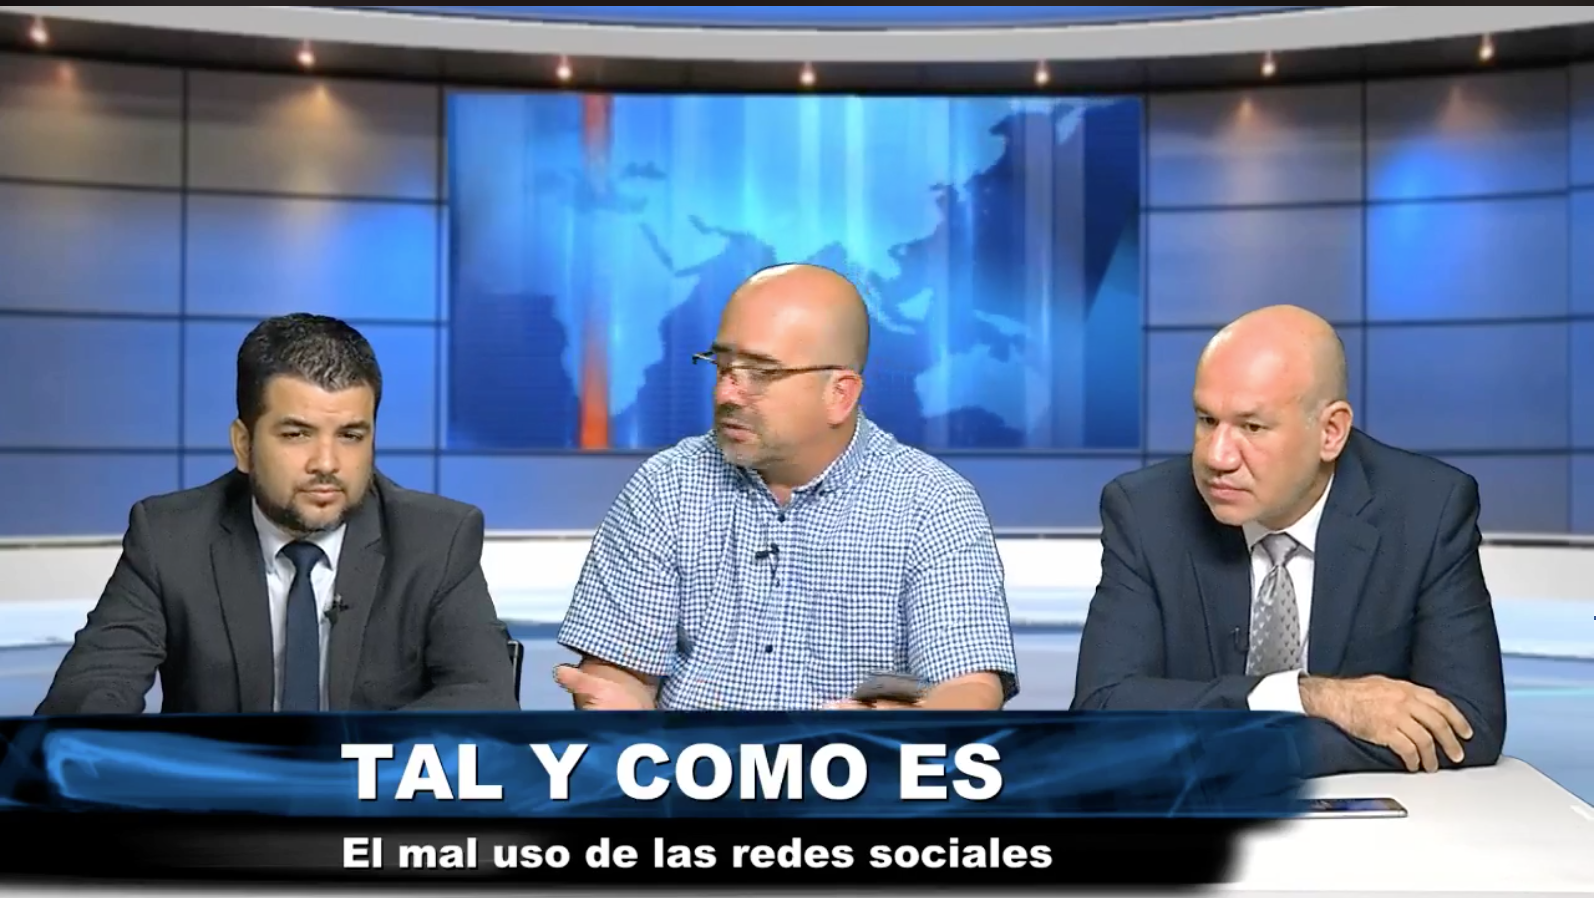 https://adalidmedrano.com/wp-content/uploads/2018/08/tal-y-como-es-noticias-columbia.png